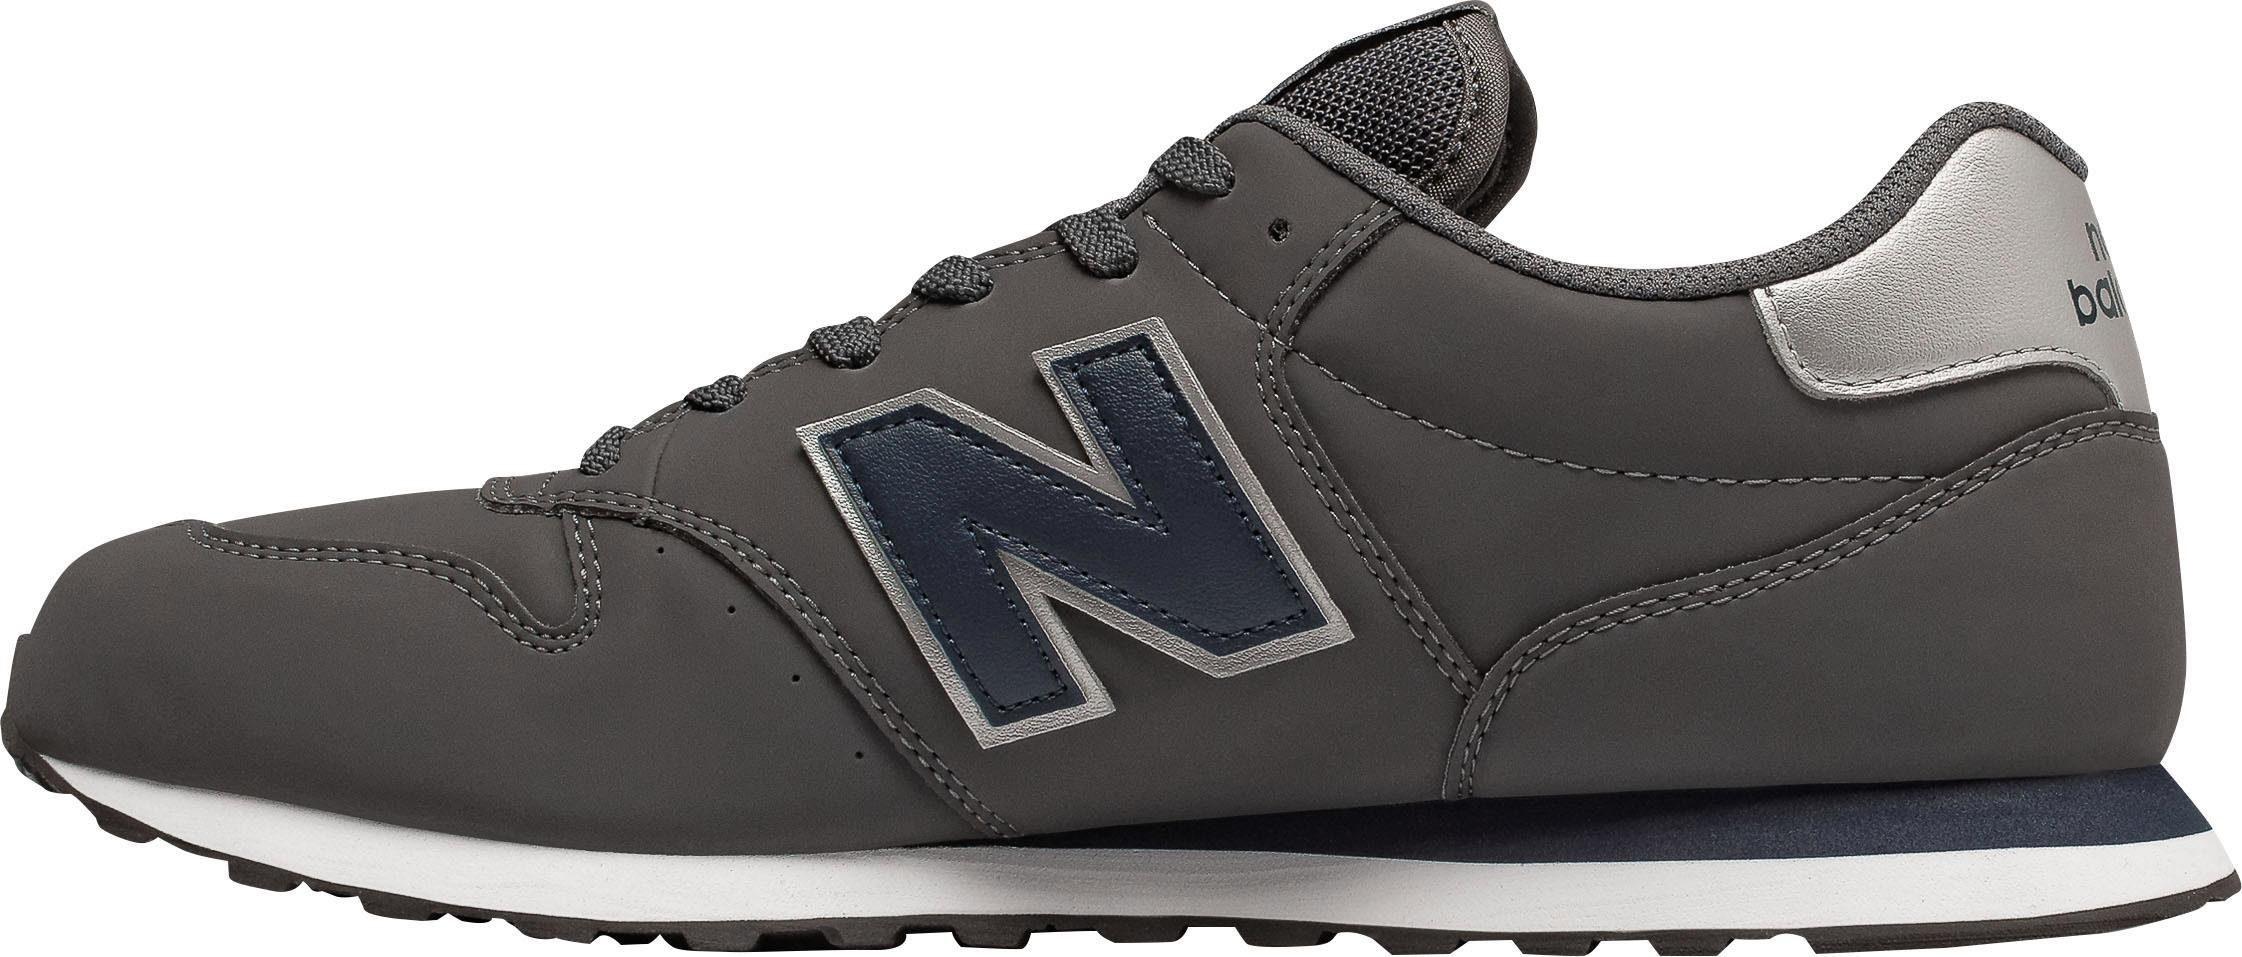 New Balance Bij Bestel Nu »gm Sneakers 500« Otto vZwxqHvr